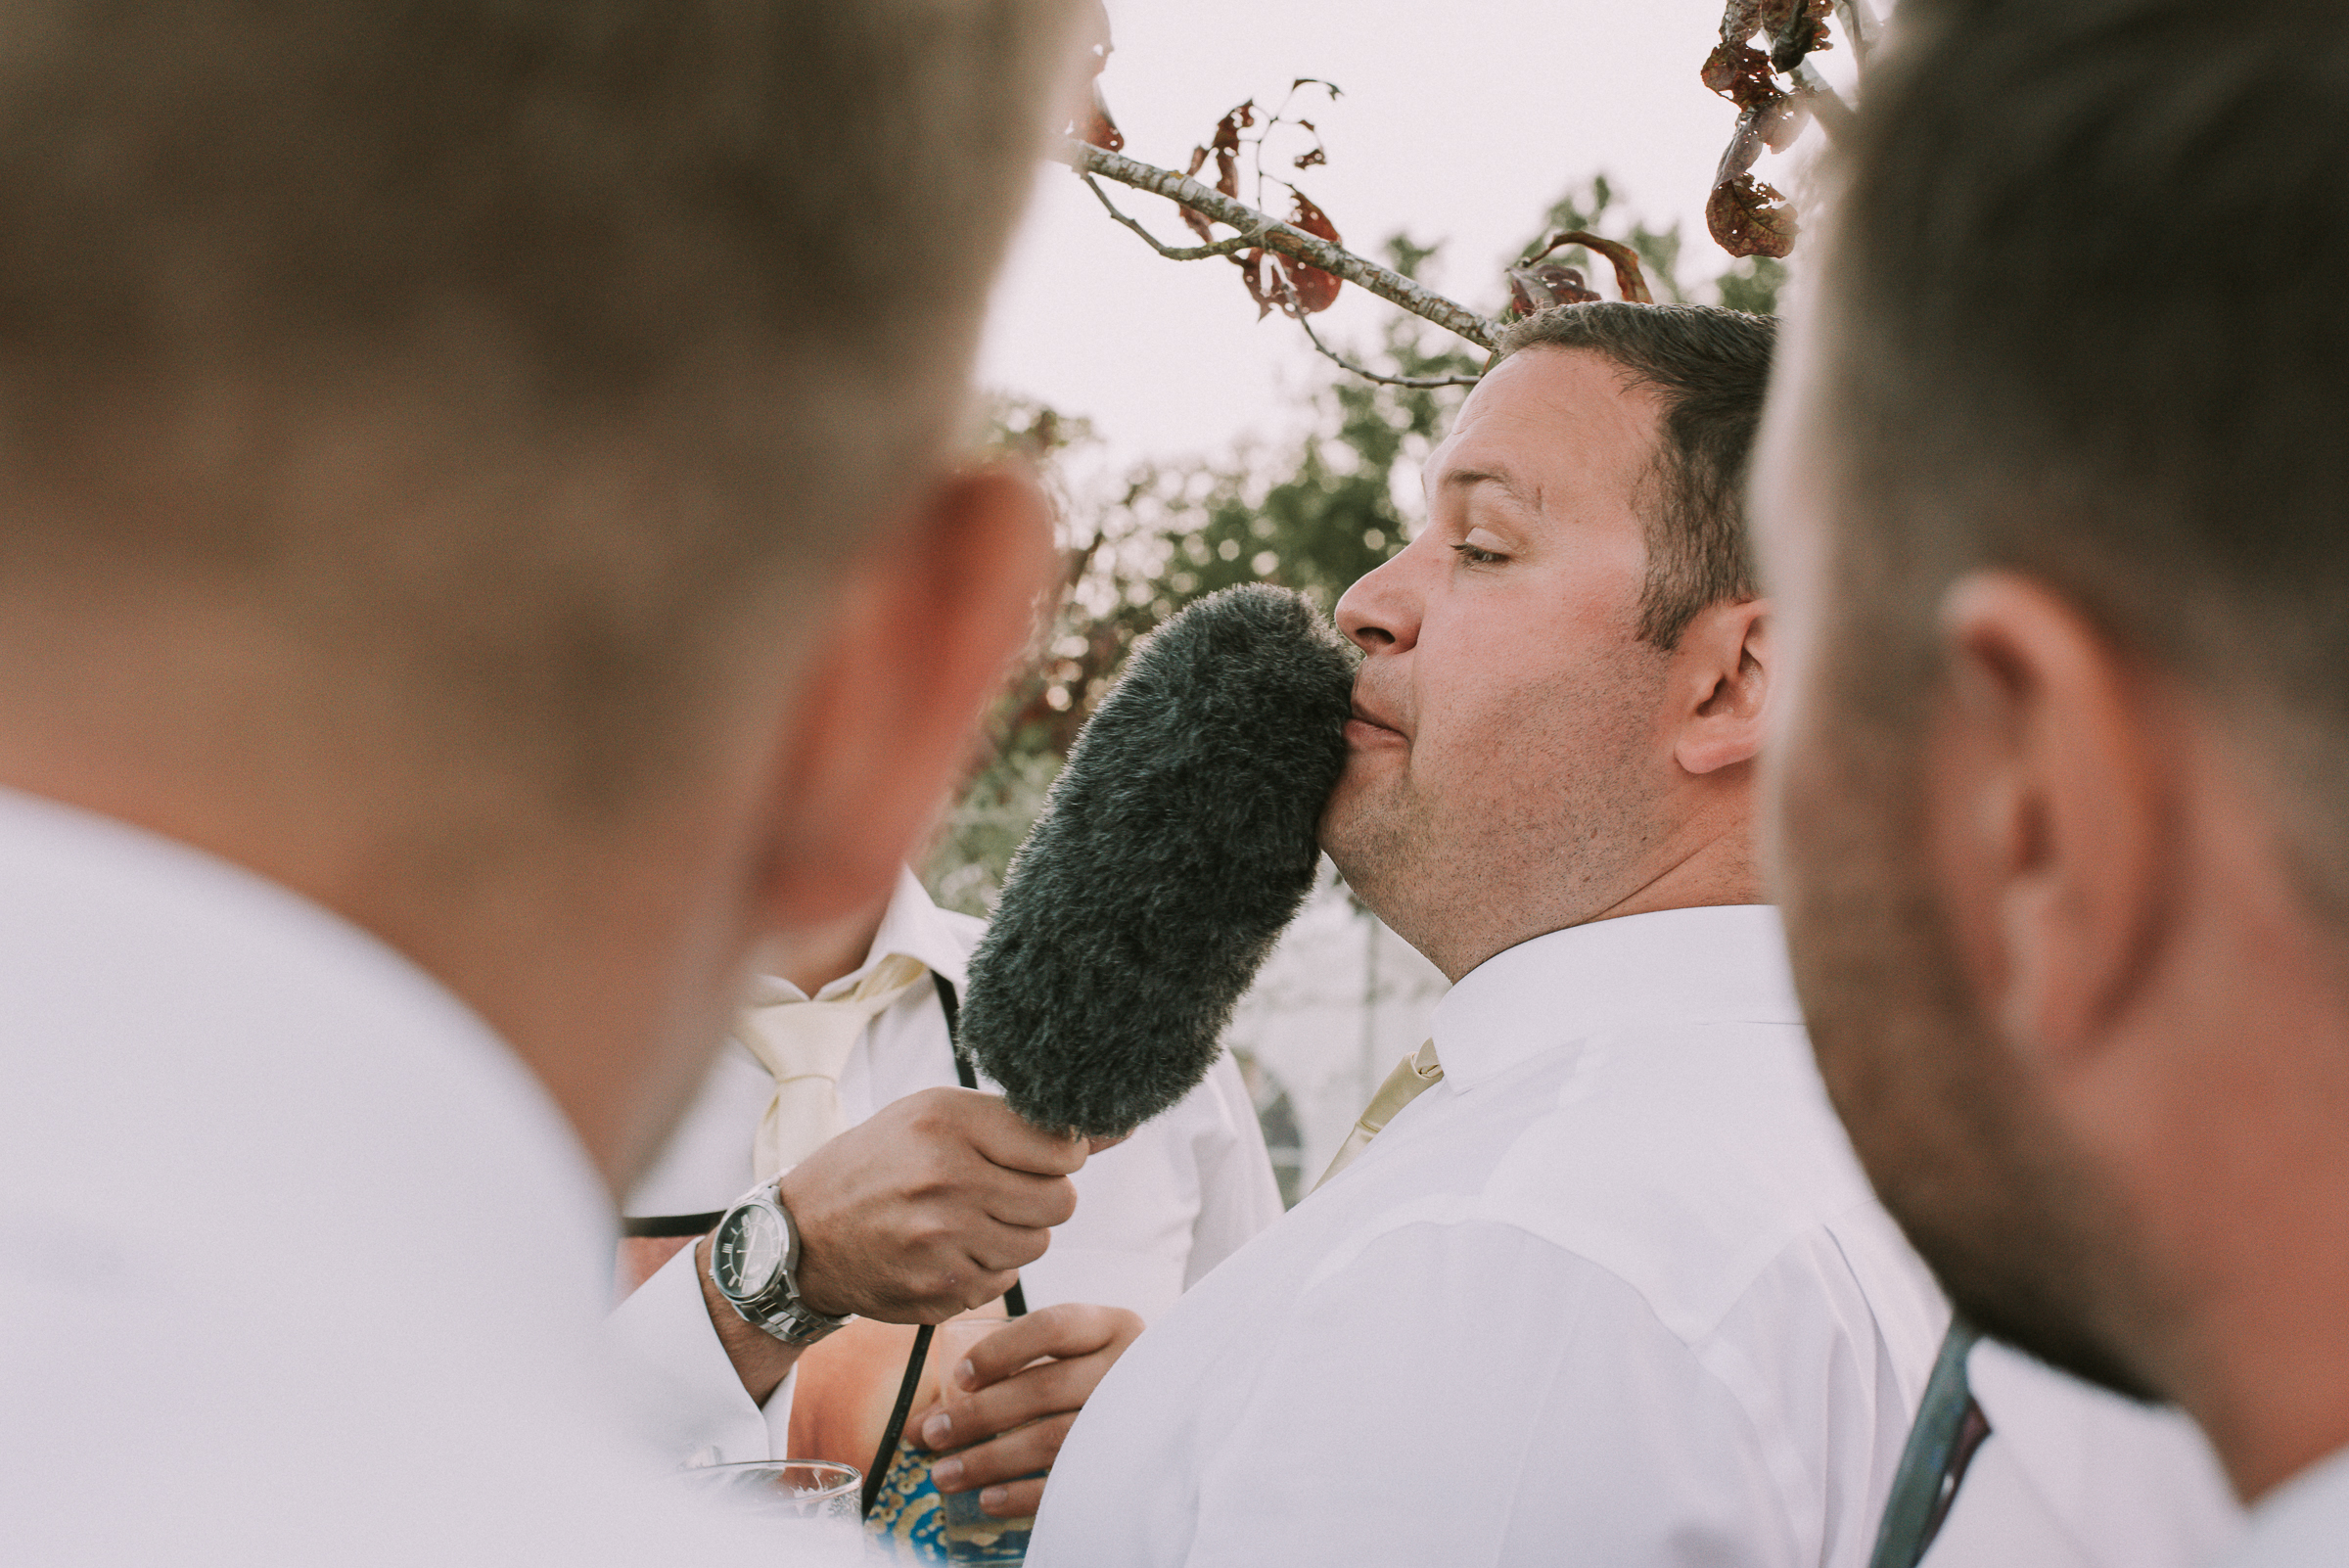 Festival Wedding Photography Secret Garden Maidstone Kent Jay Tunbridge Photorgaphic Co-52.jpg